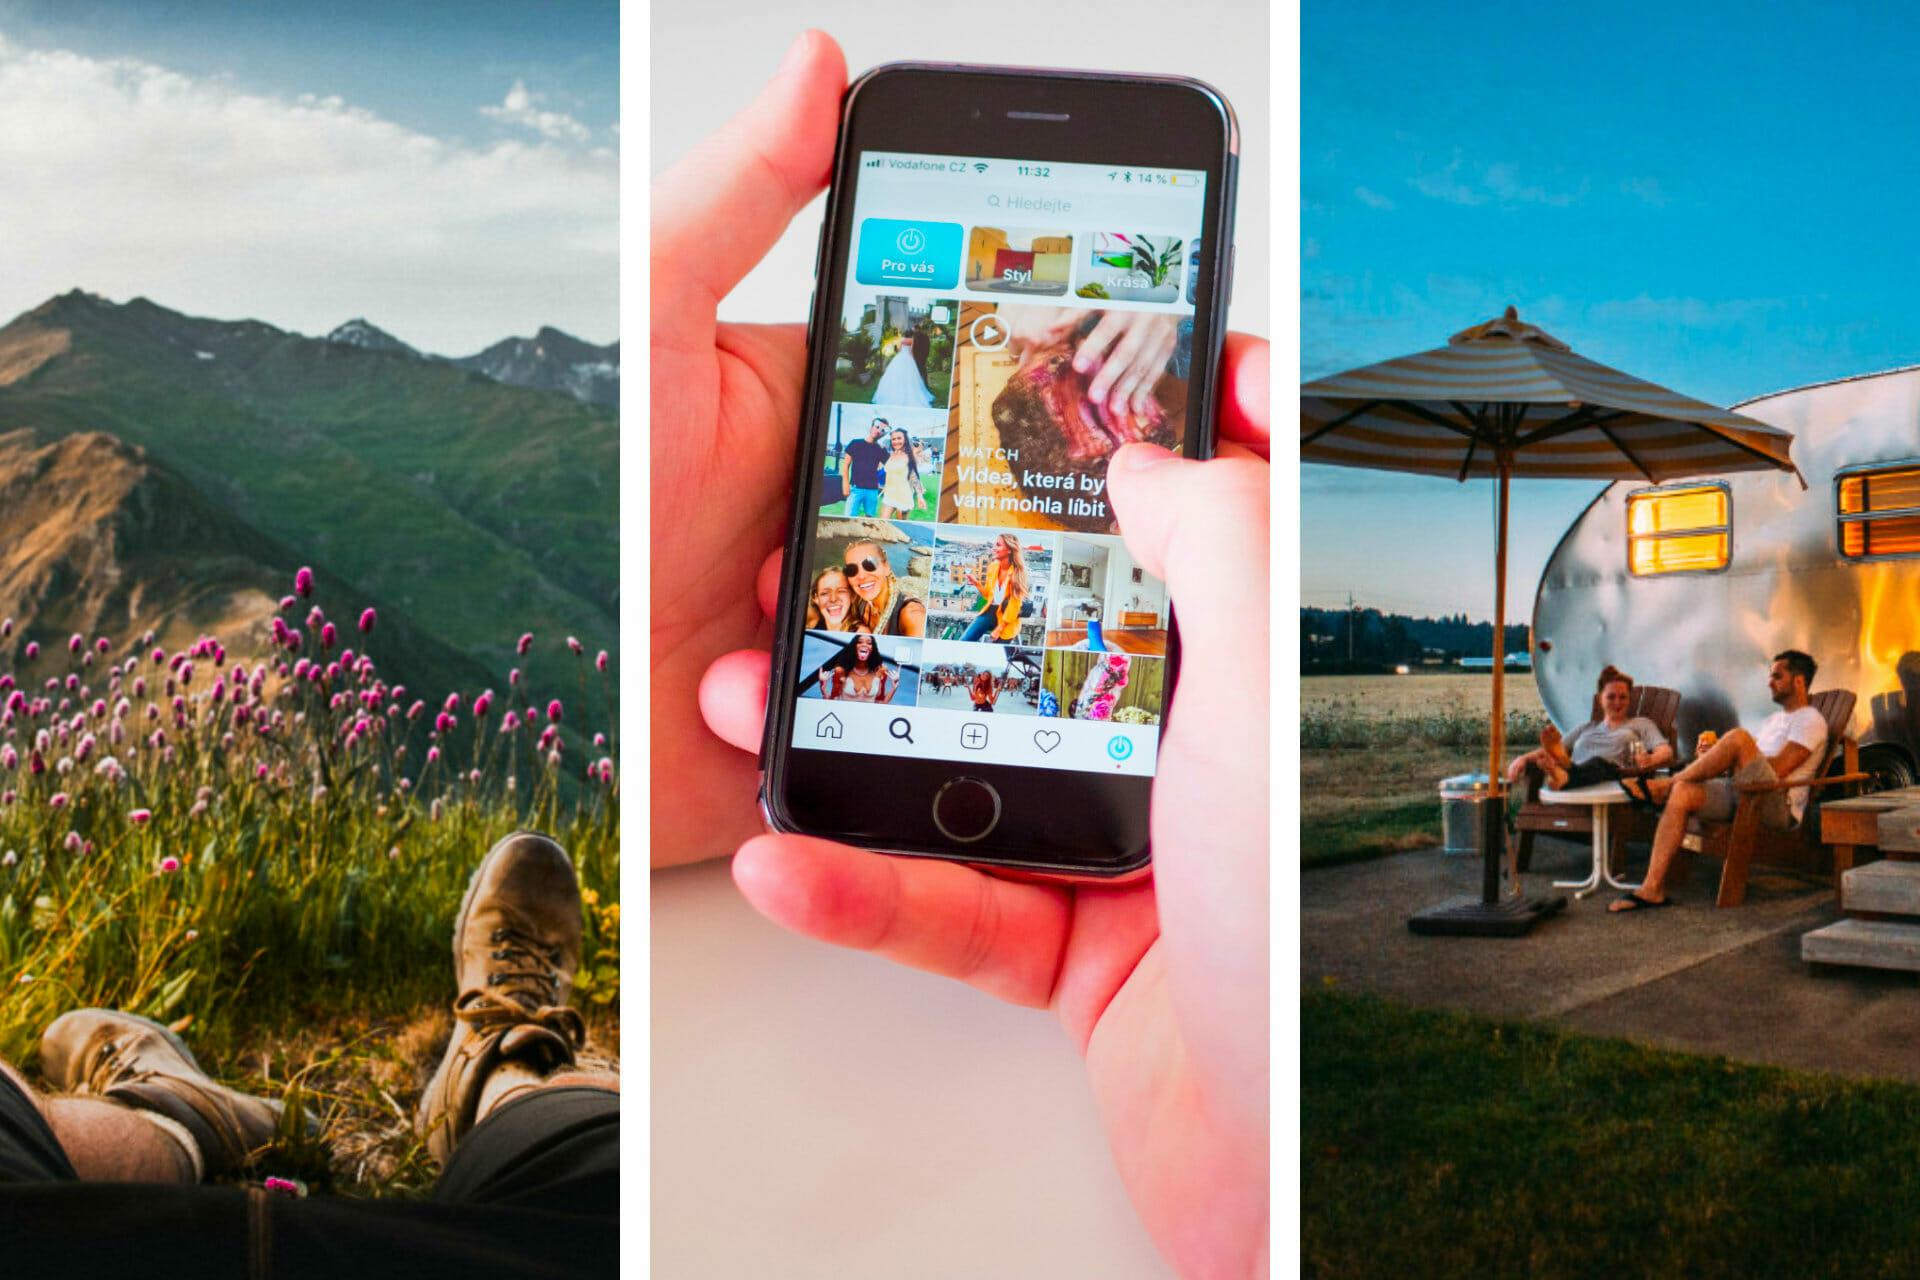 53 Unique Camping Instagram Captions for the Perfect Post via @allamericanatlas